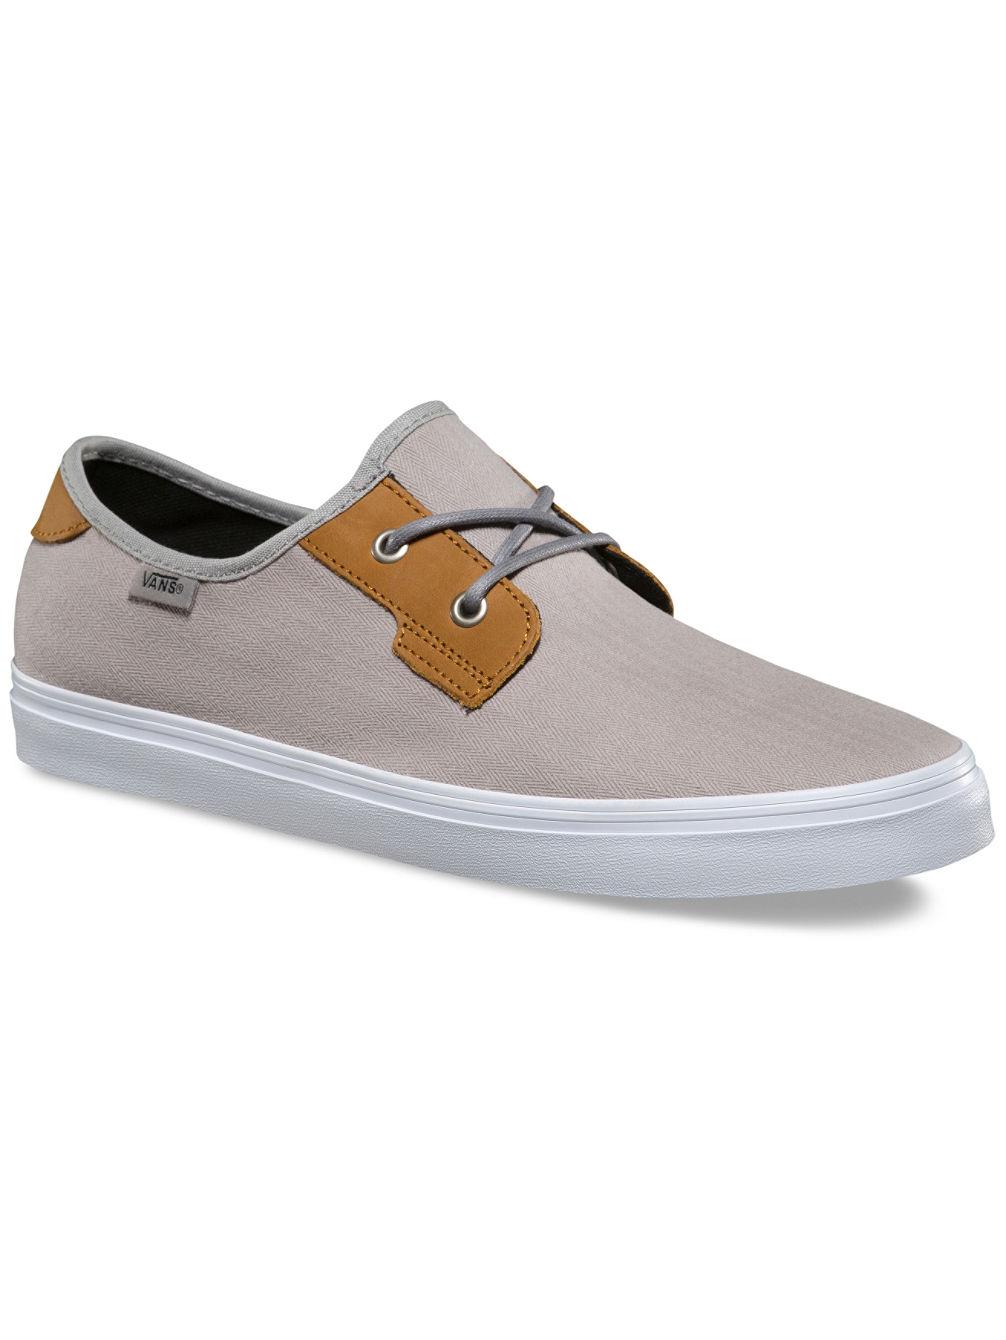 da899caa4fab Buy Vans Michoacan Sf Sneakers online at blue-tomato.com